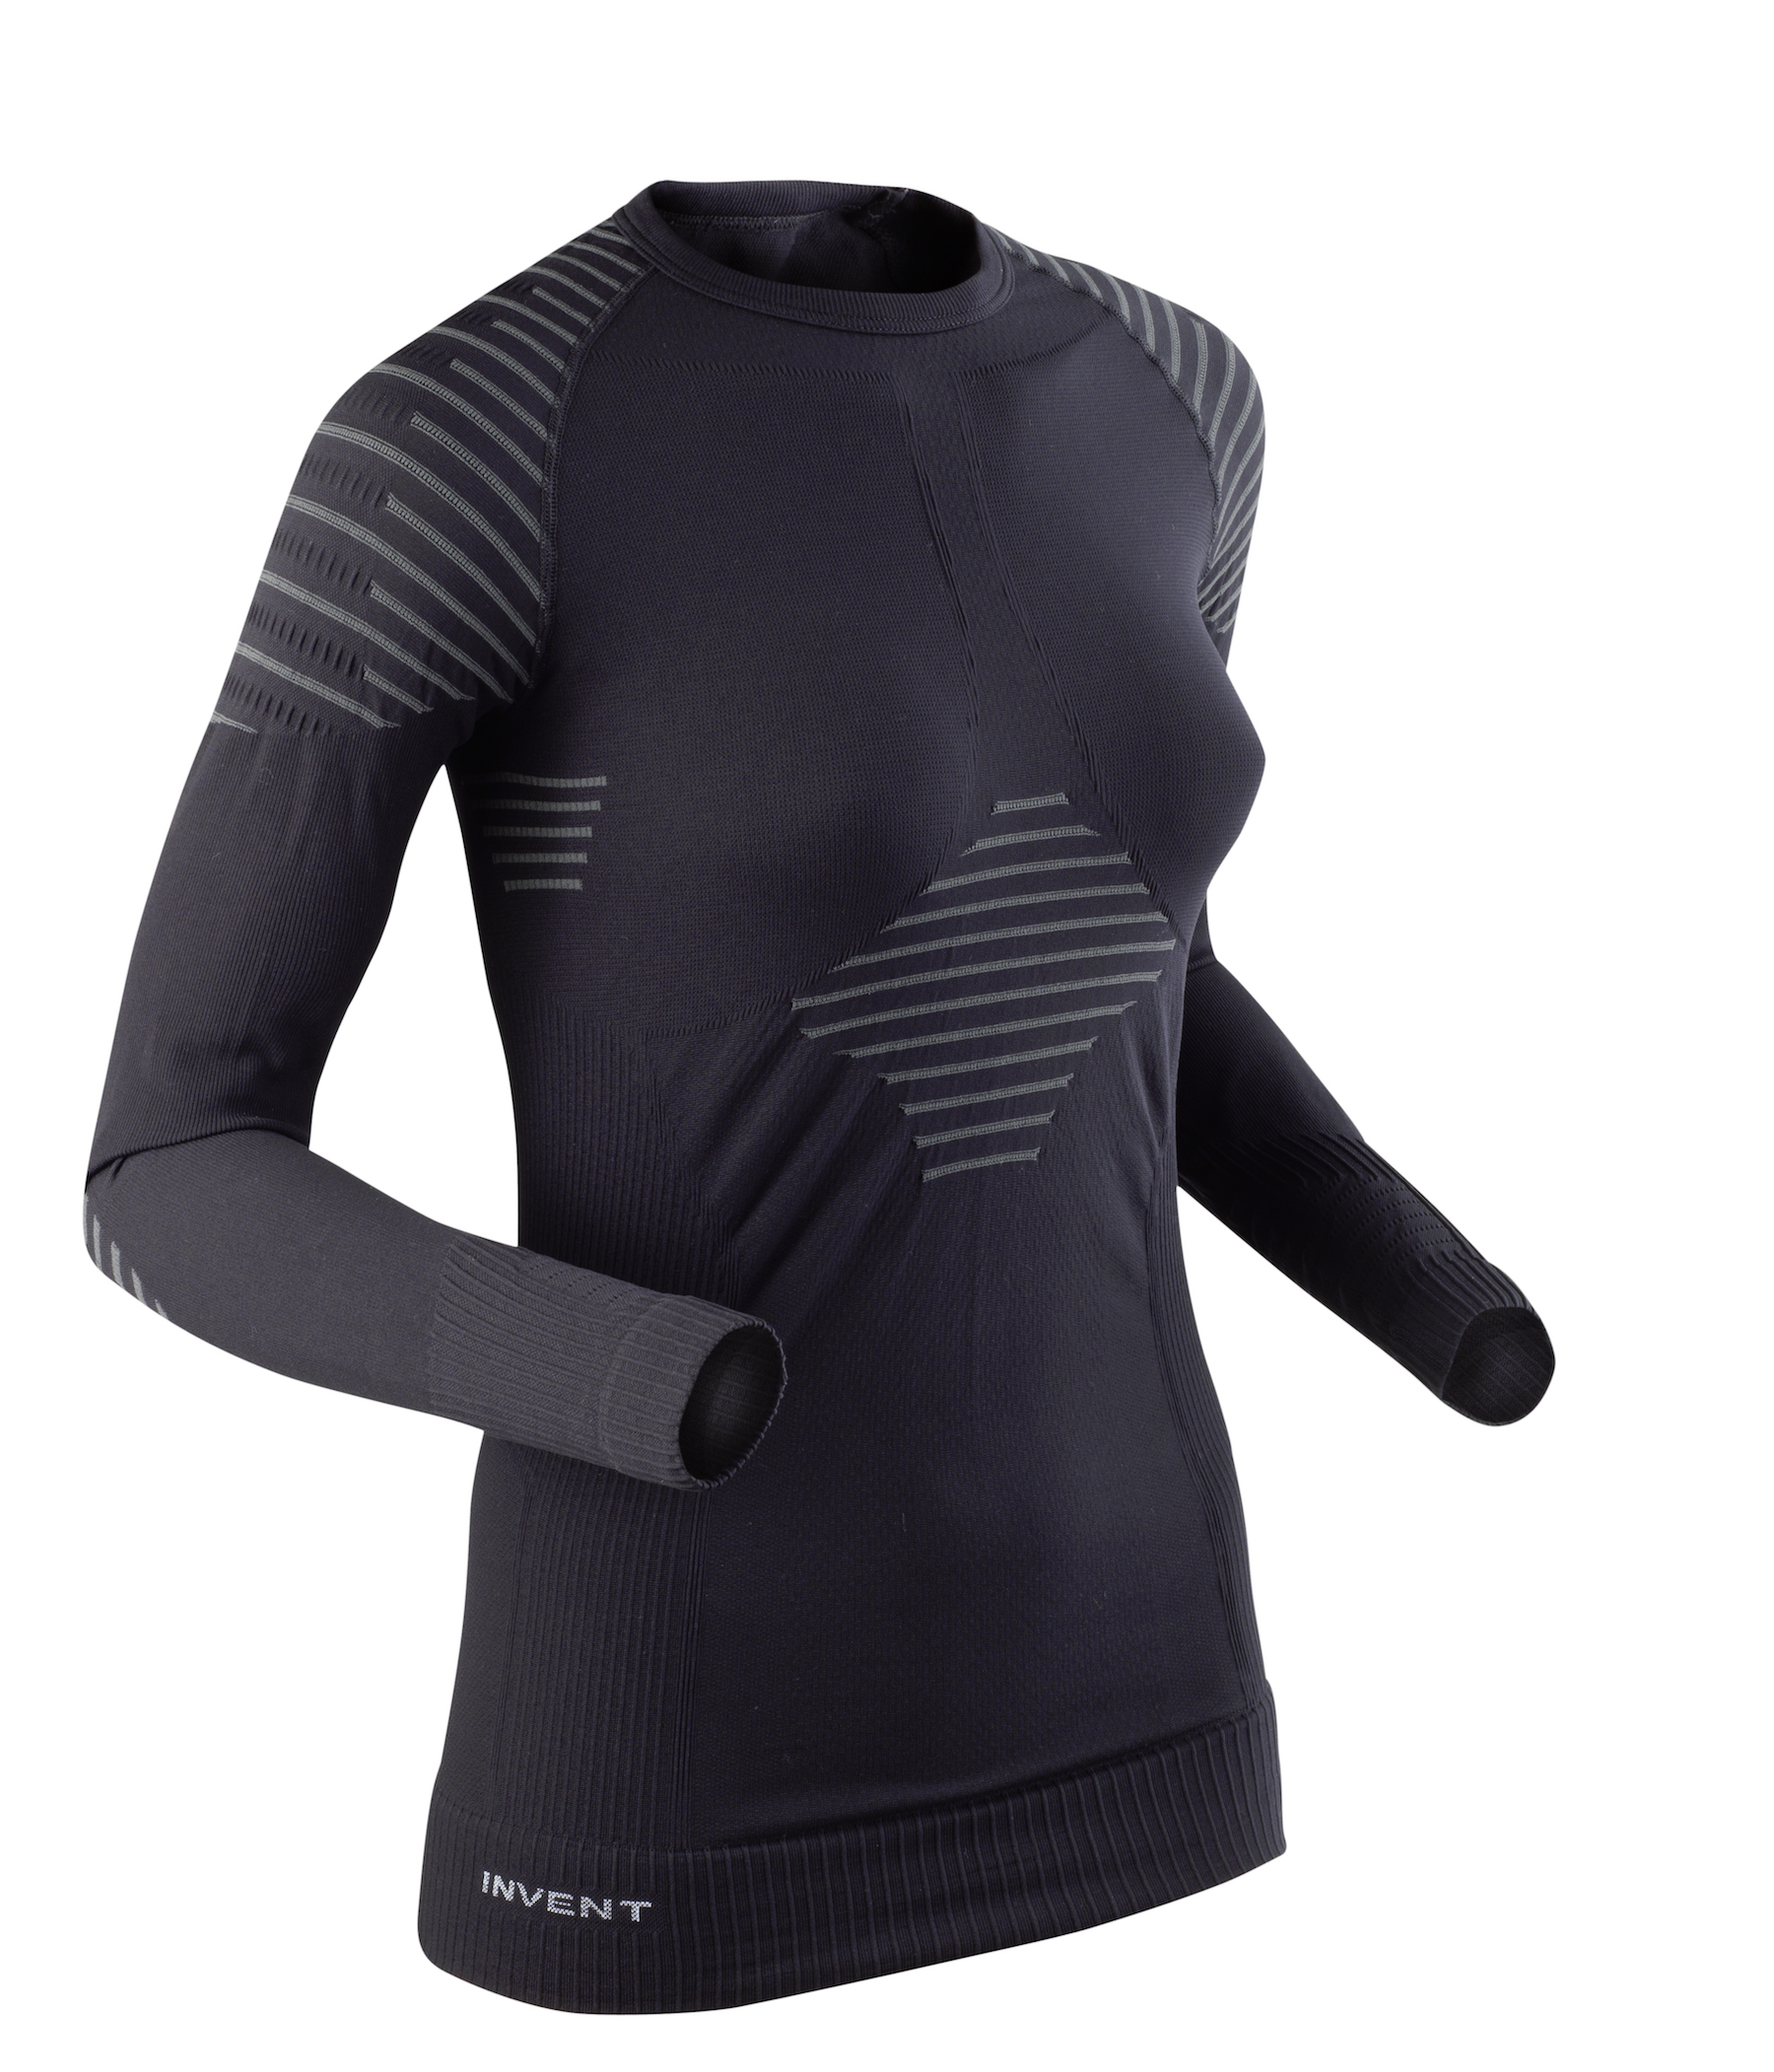 X-Bionic - Invent shirt long sleeves - Base layer - Women's